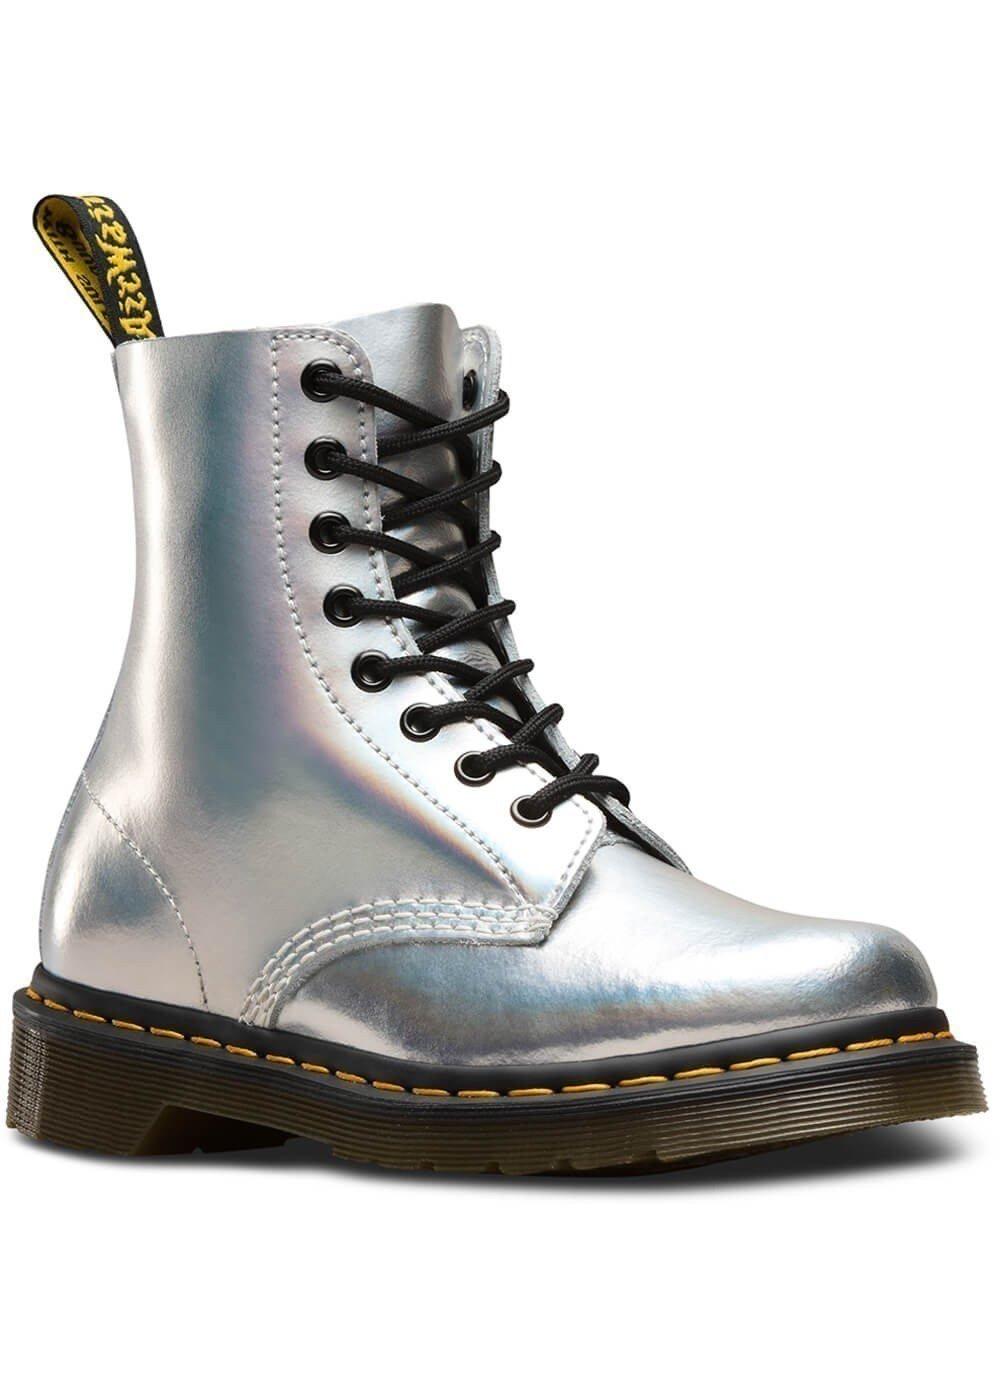 Dr. Martens reflective combat boots